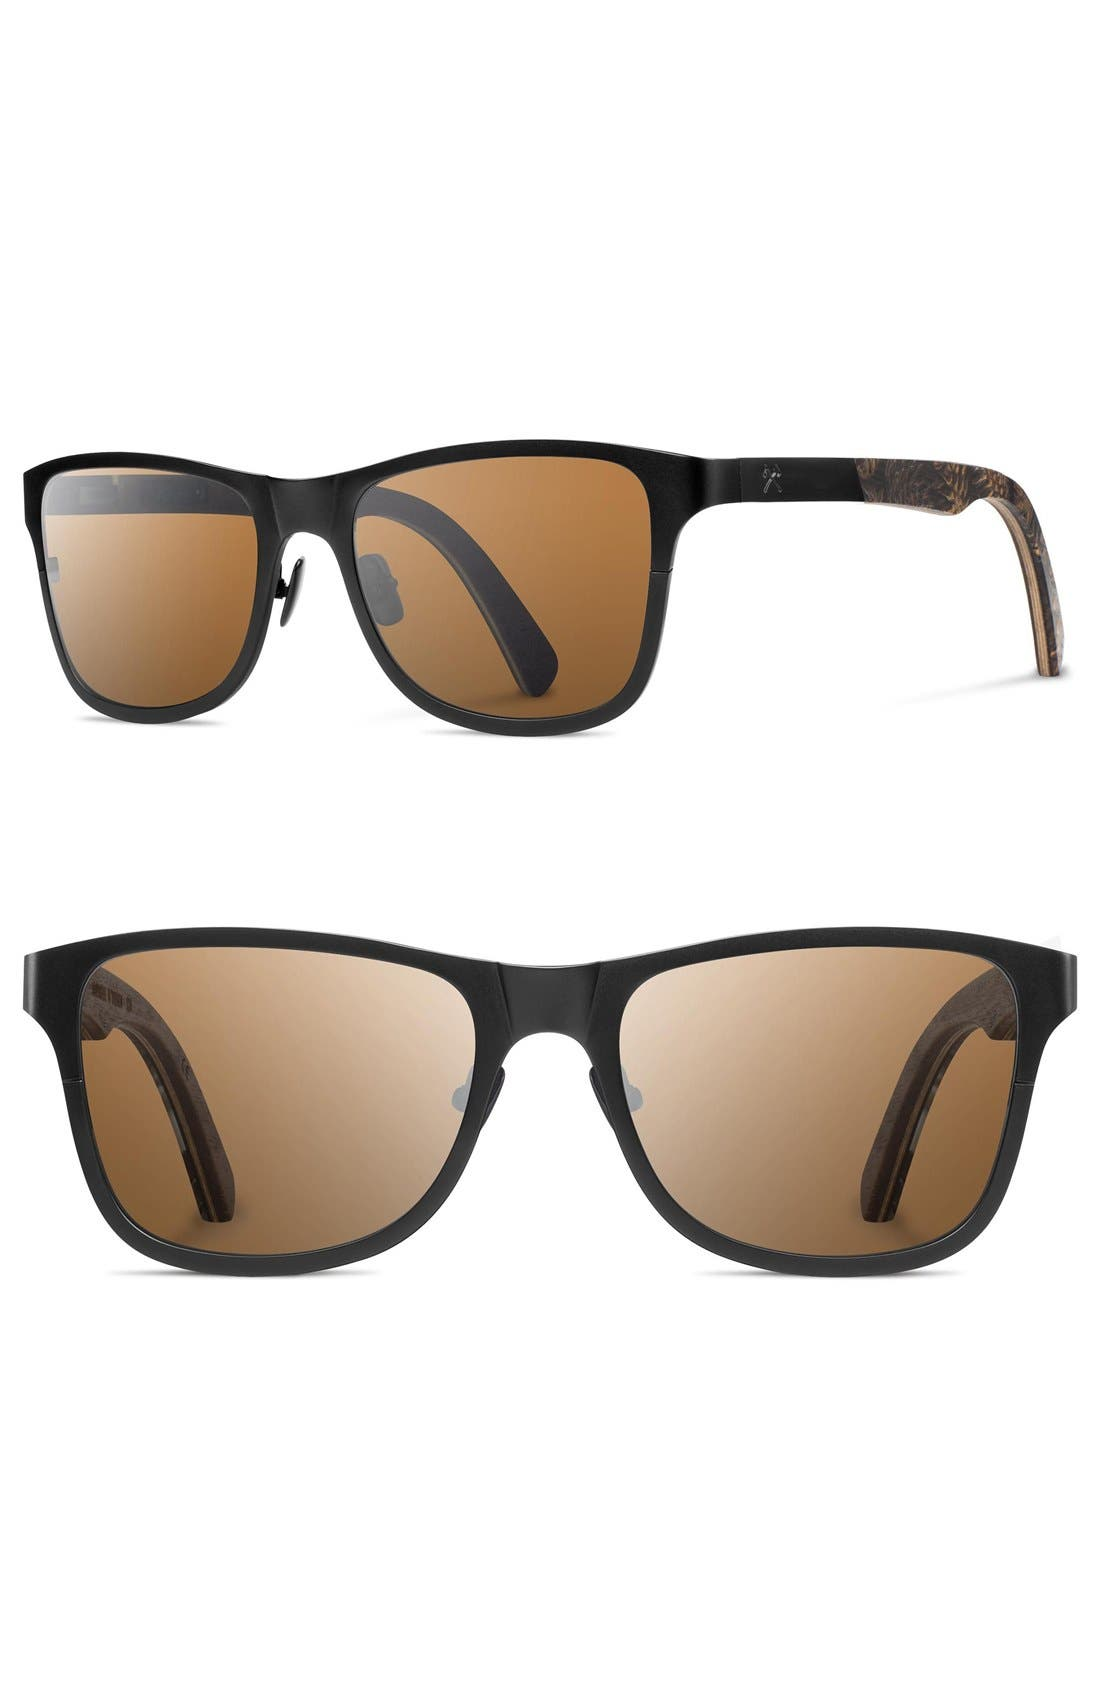 Shwood Canby 54mm Polarized Pine Cone & Titanium Sunglasses